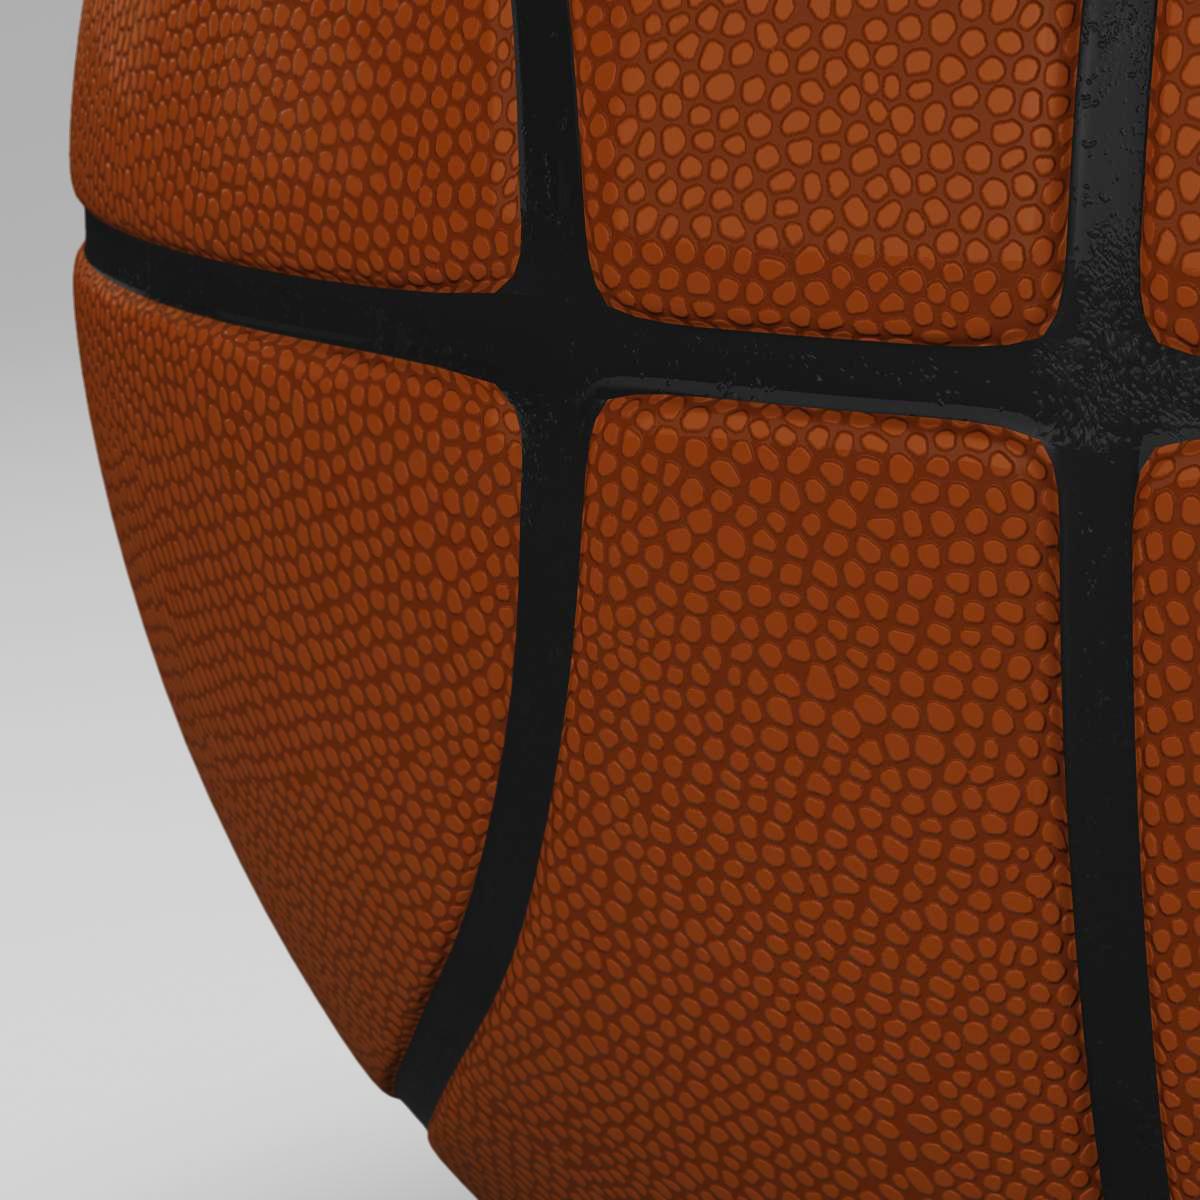 standard basketball ball 3d model 3ds max fbx c4d ma mb obj 164716